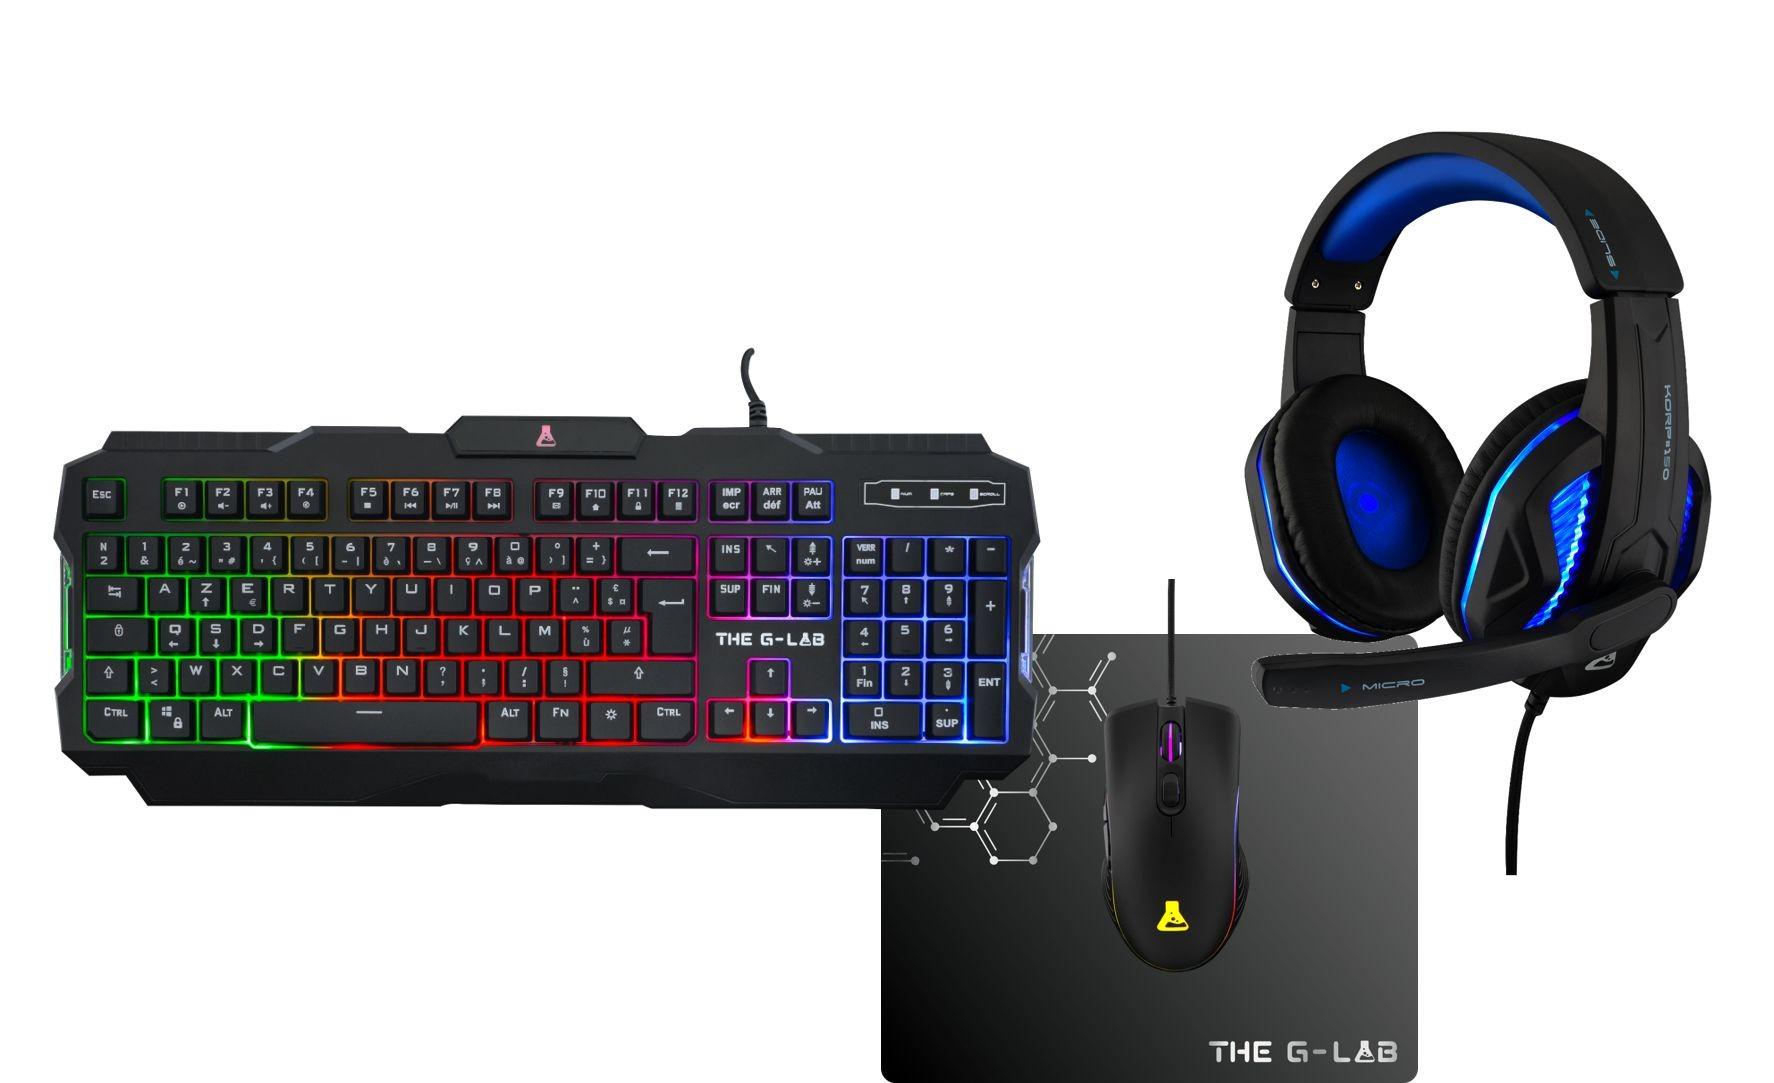 Pack gaming G-LAB  ARGON -  clavier gamer filaire + souris + casque + tapis